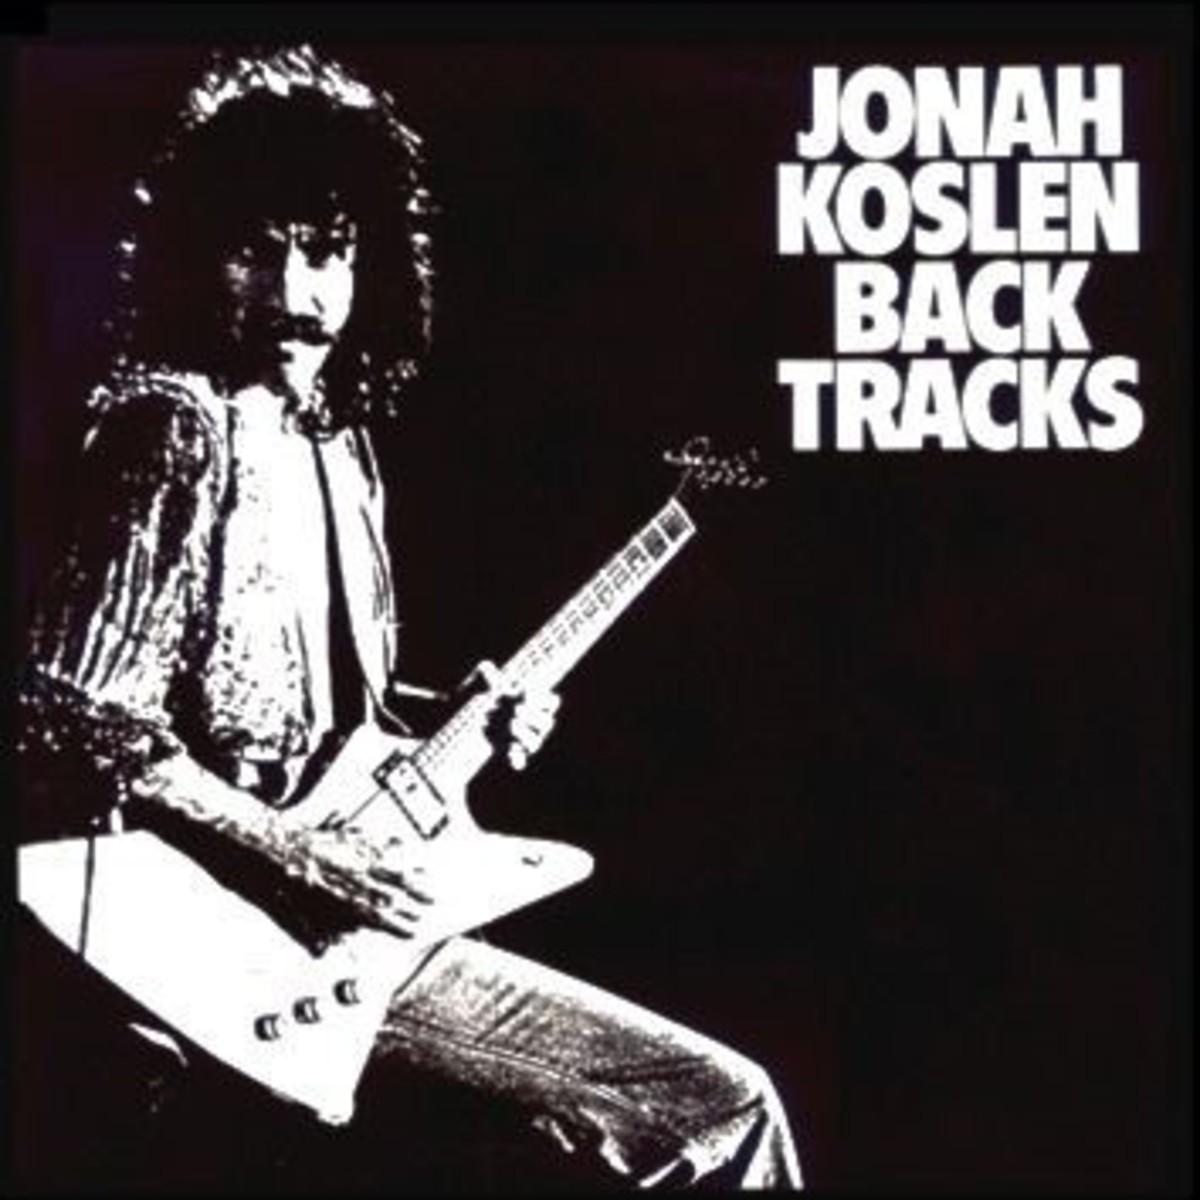 Popovich Koslen Back Tracks